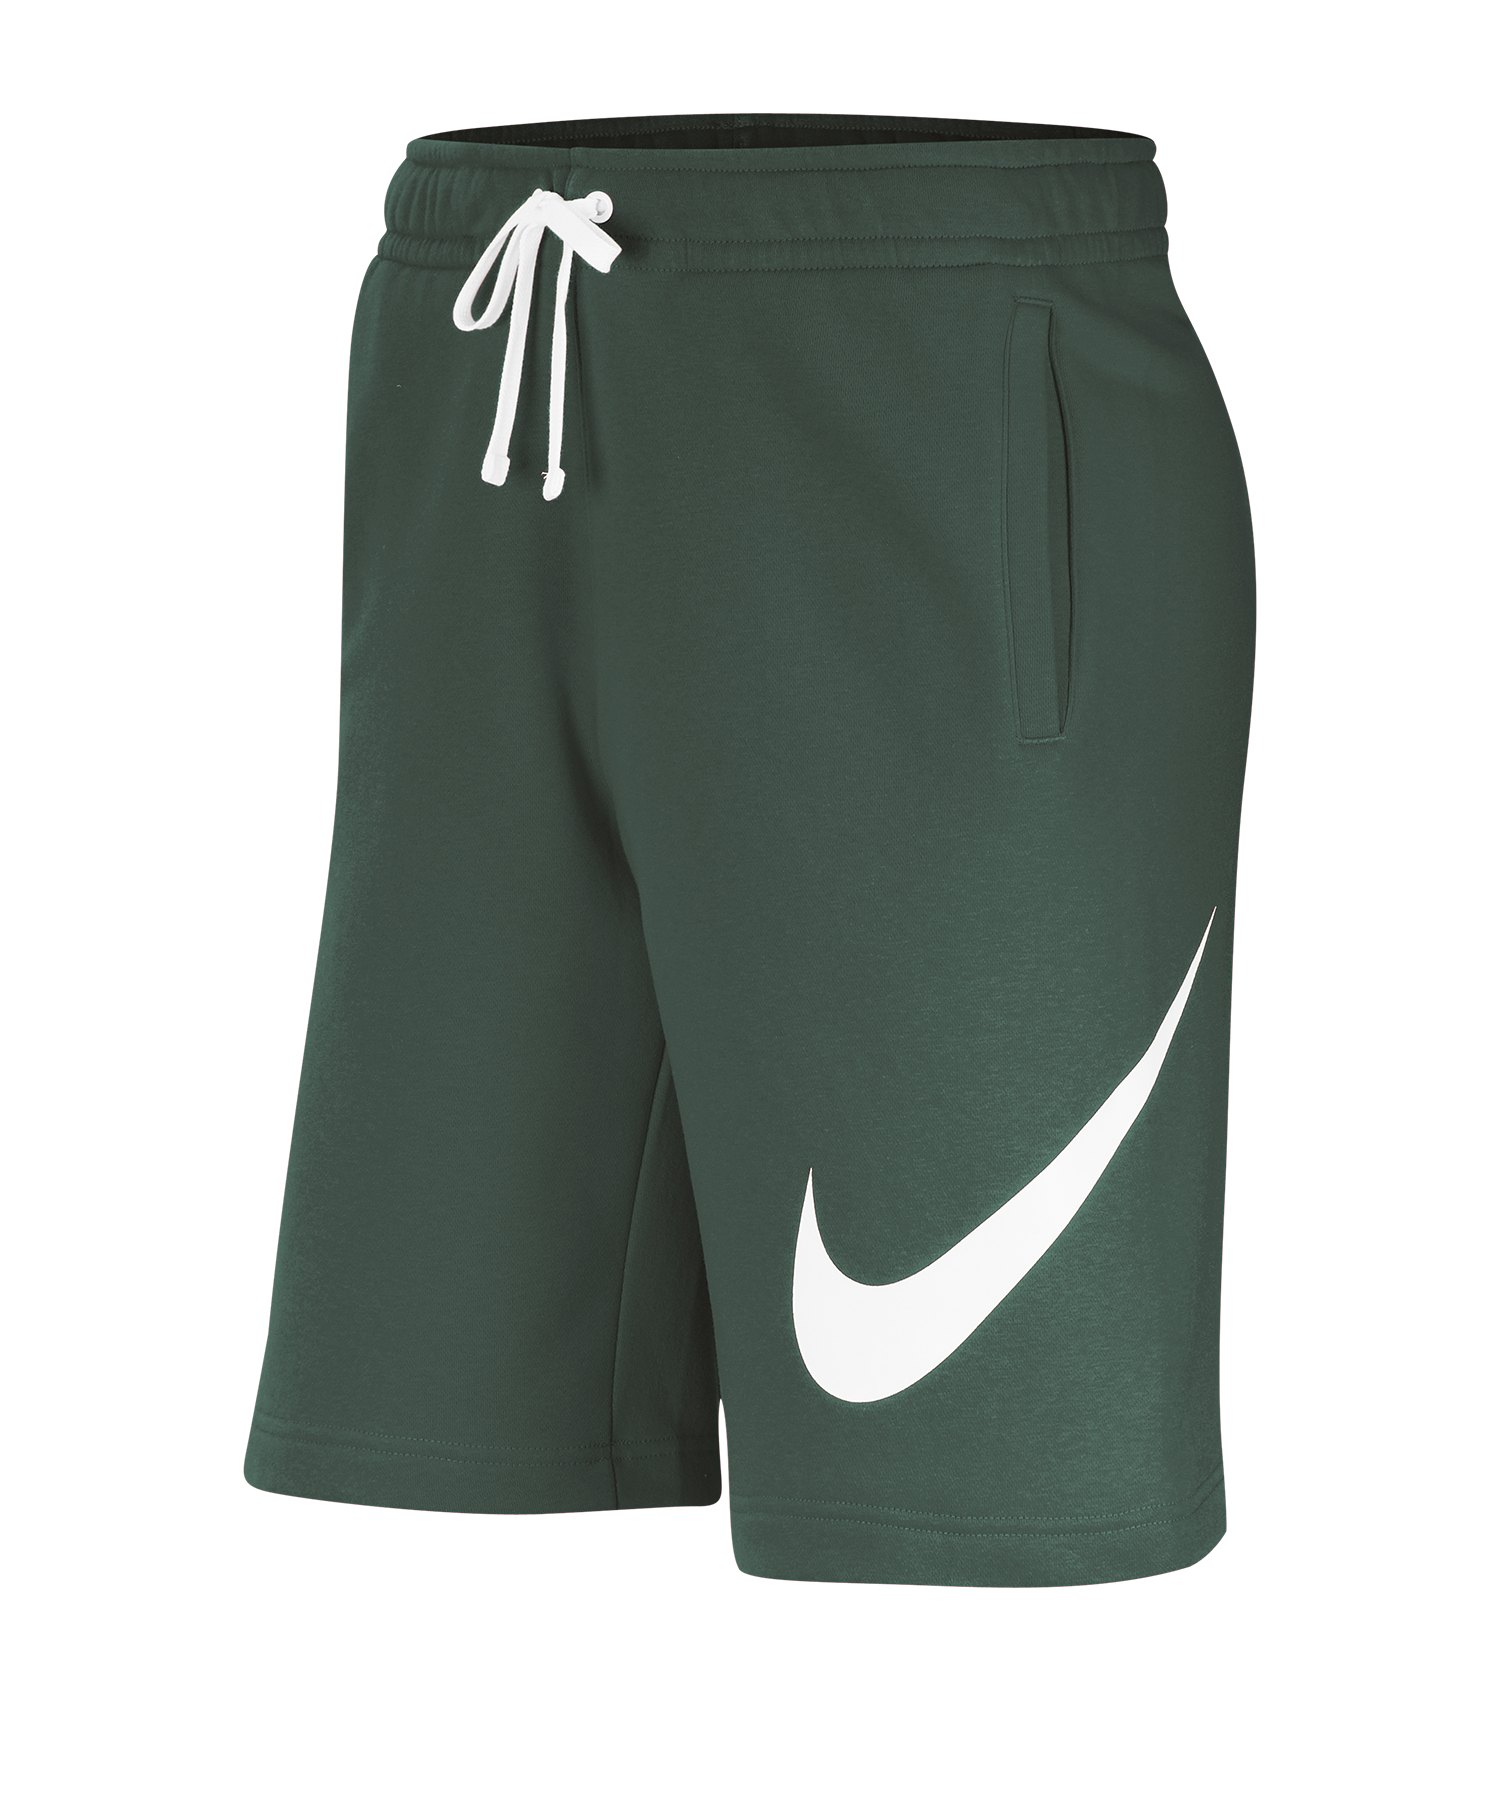 Nike Club Short Hose kurz F370 - gruen